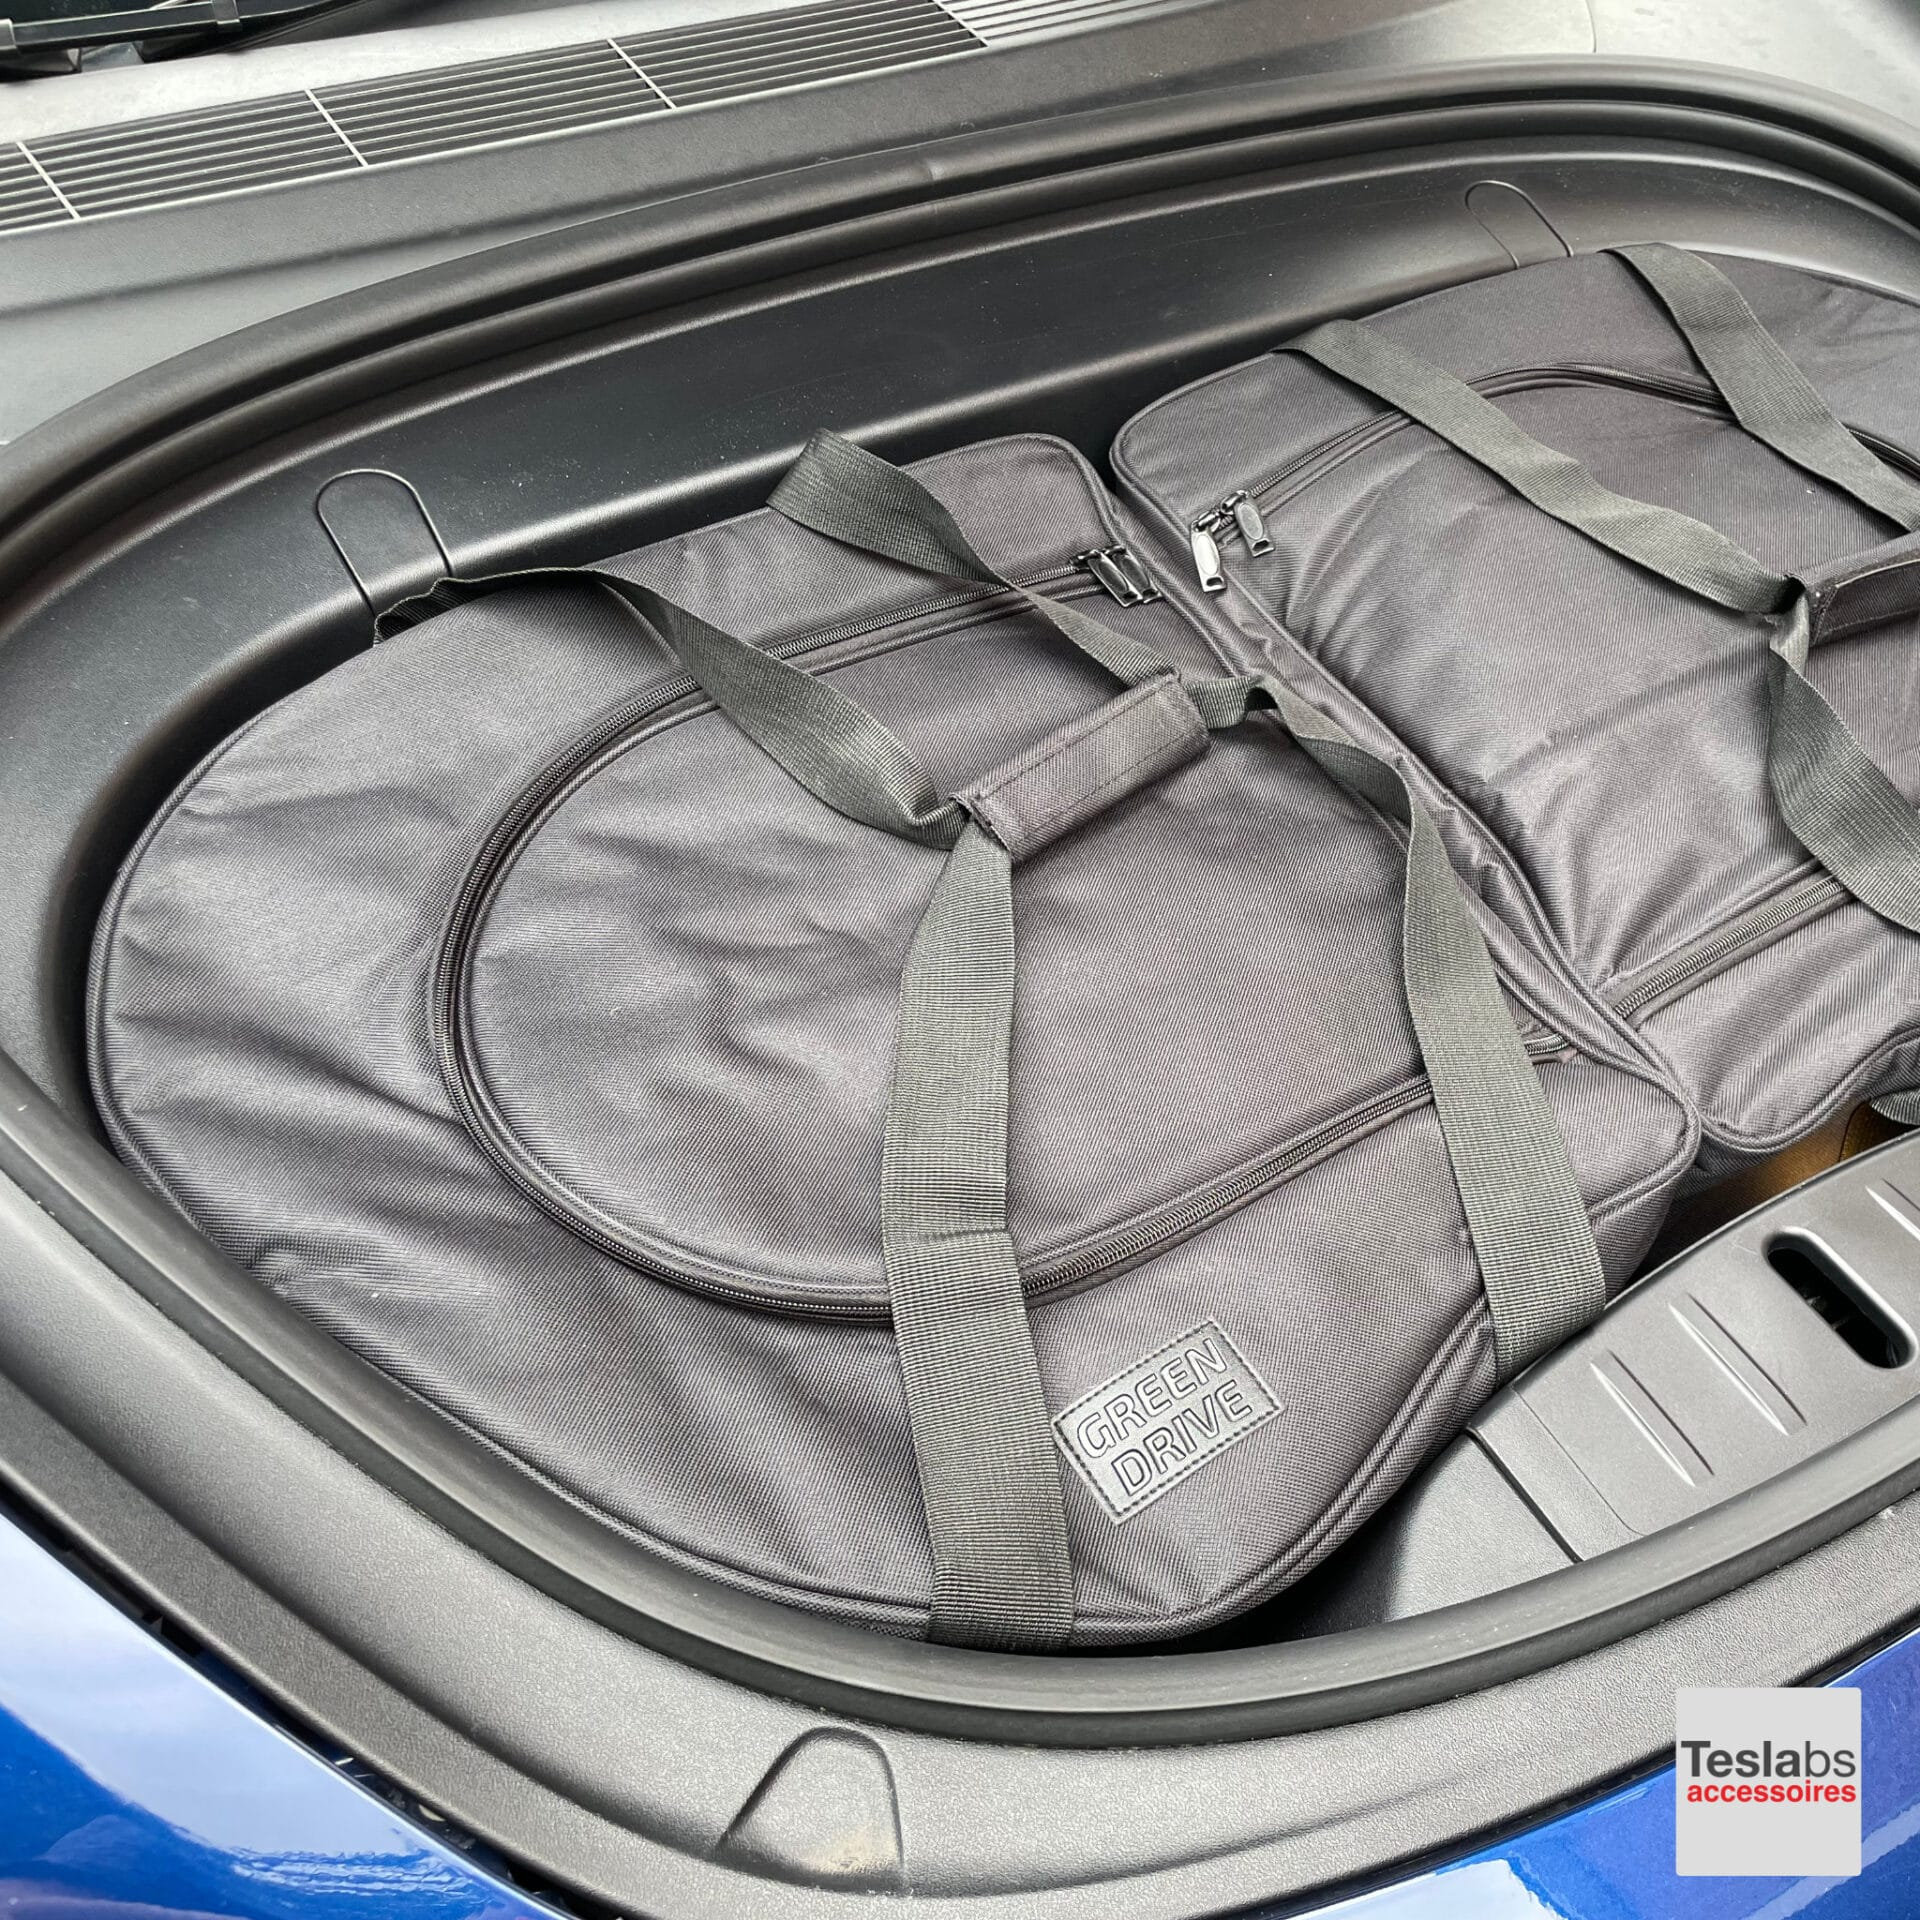 Tesla Model 3 - Frunk koeltassen set dicht in frunk dicht